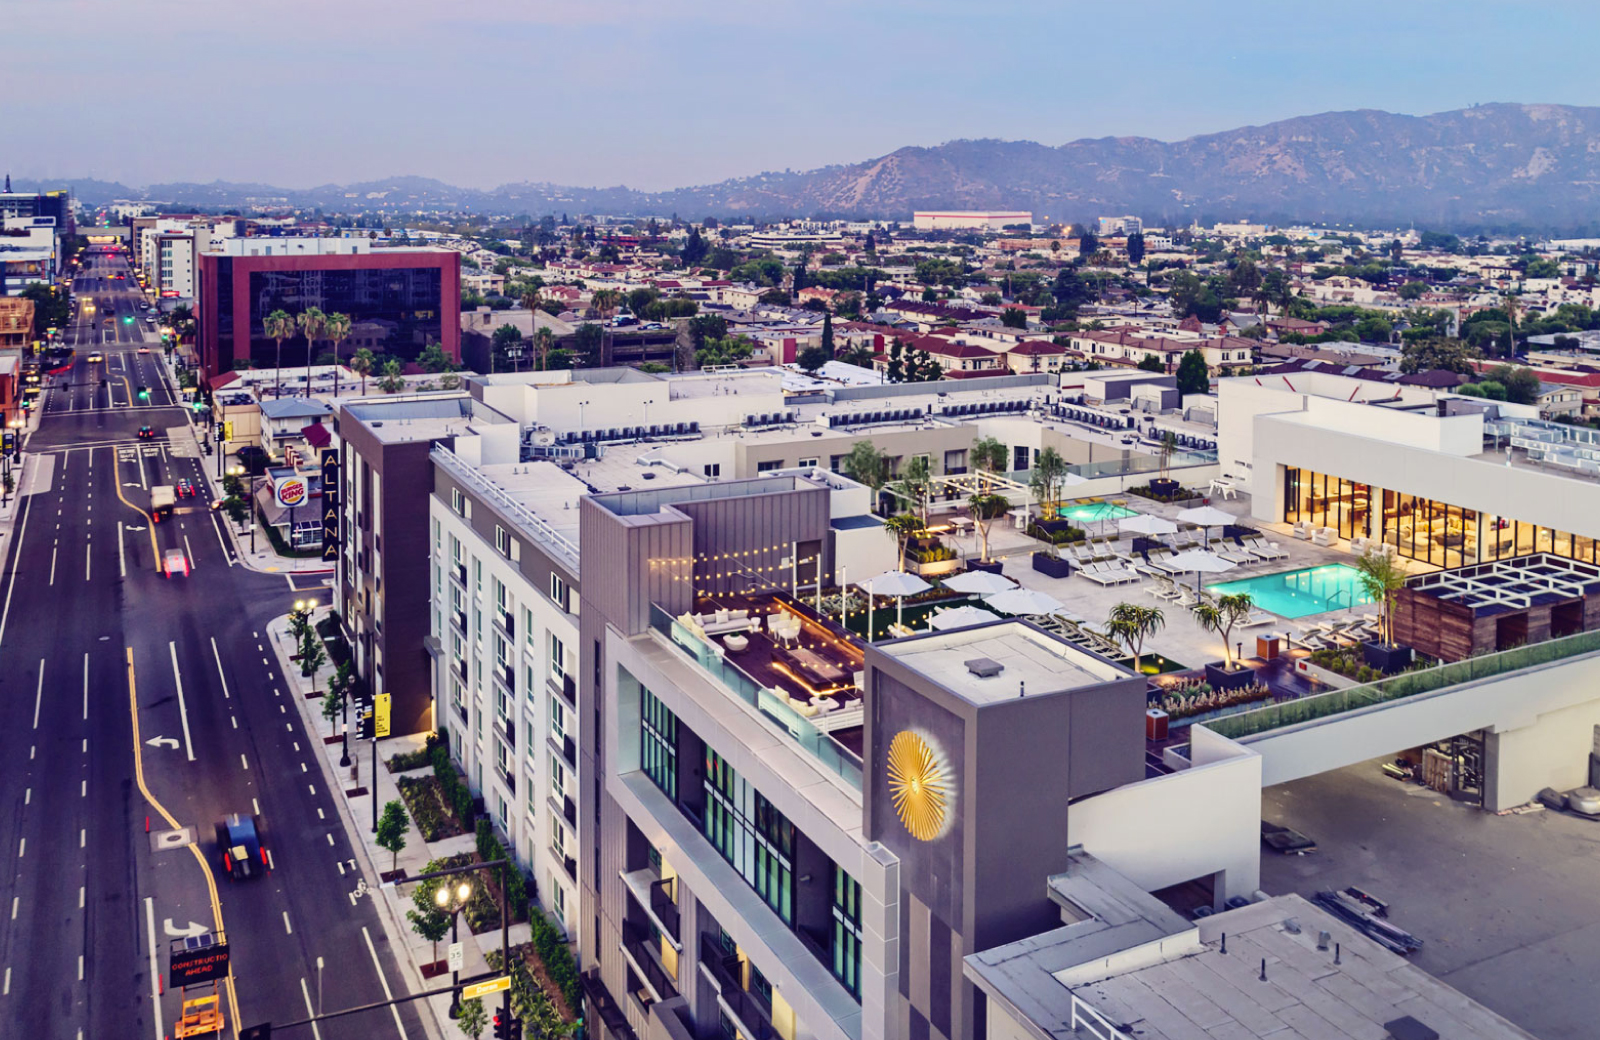 Glendale Downtown Image - Altana Apts